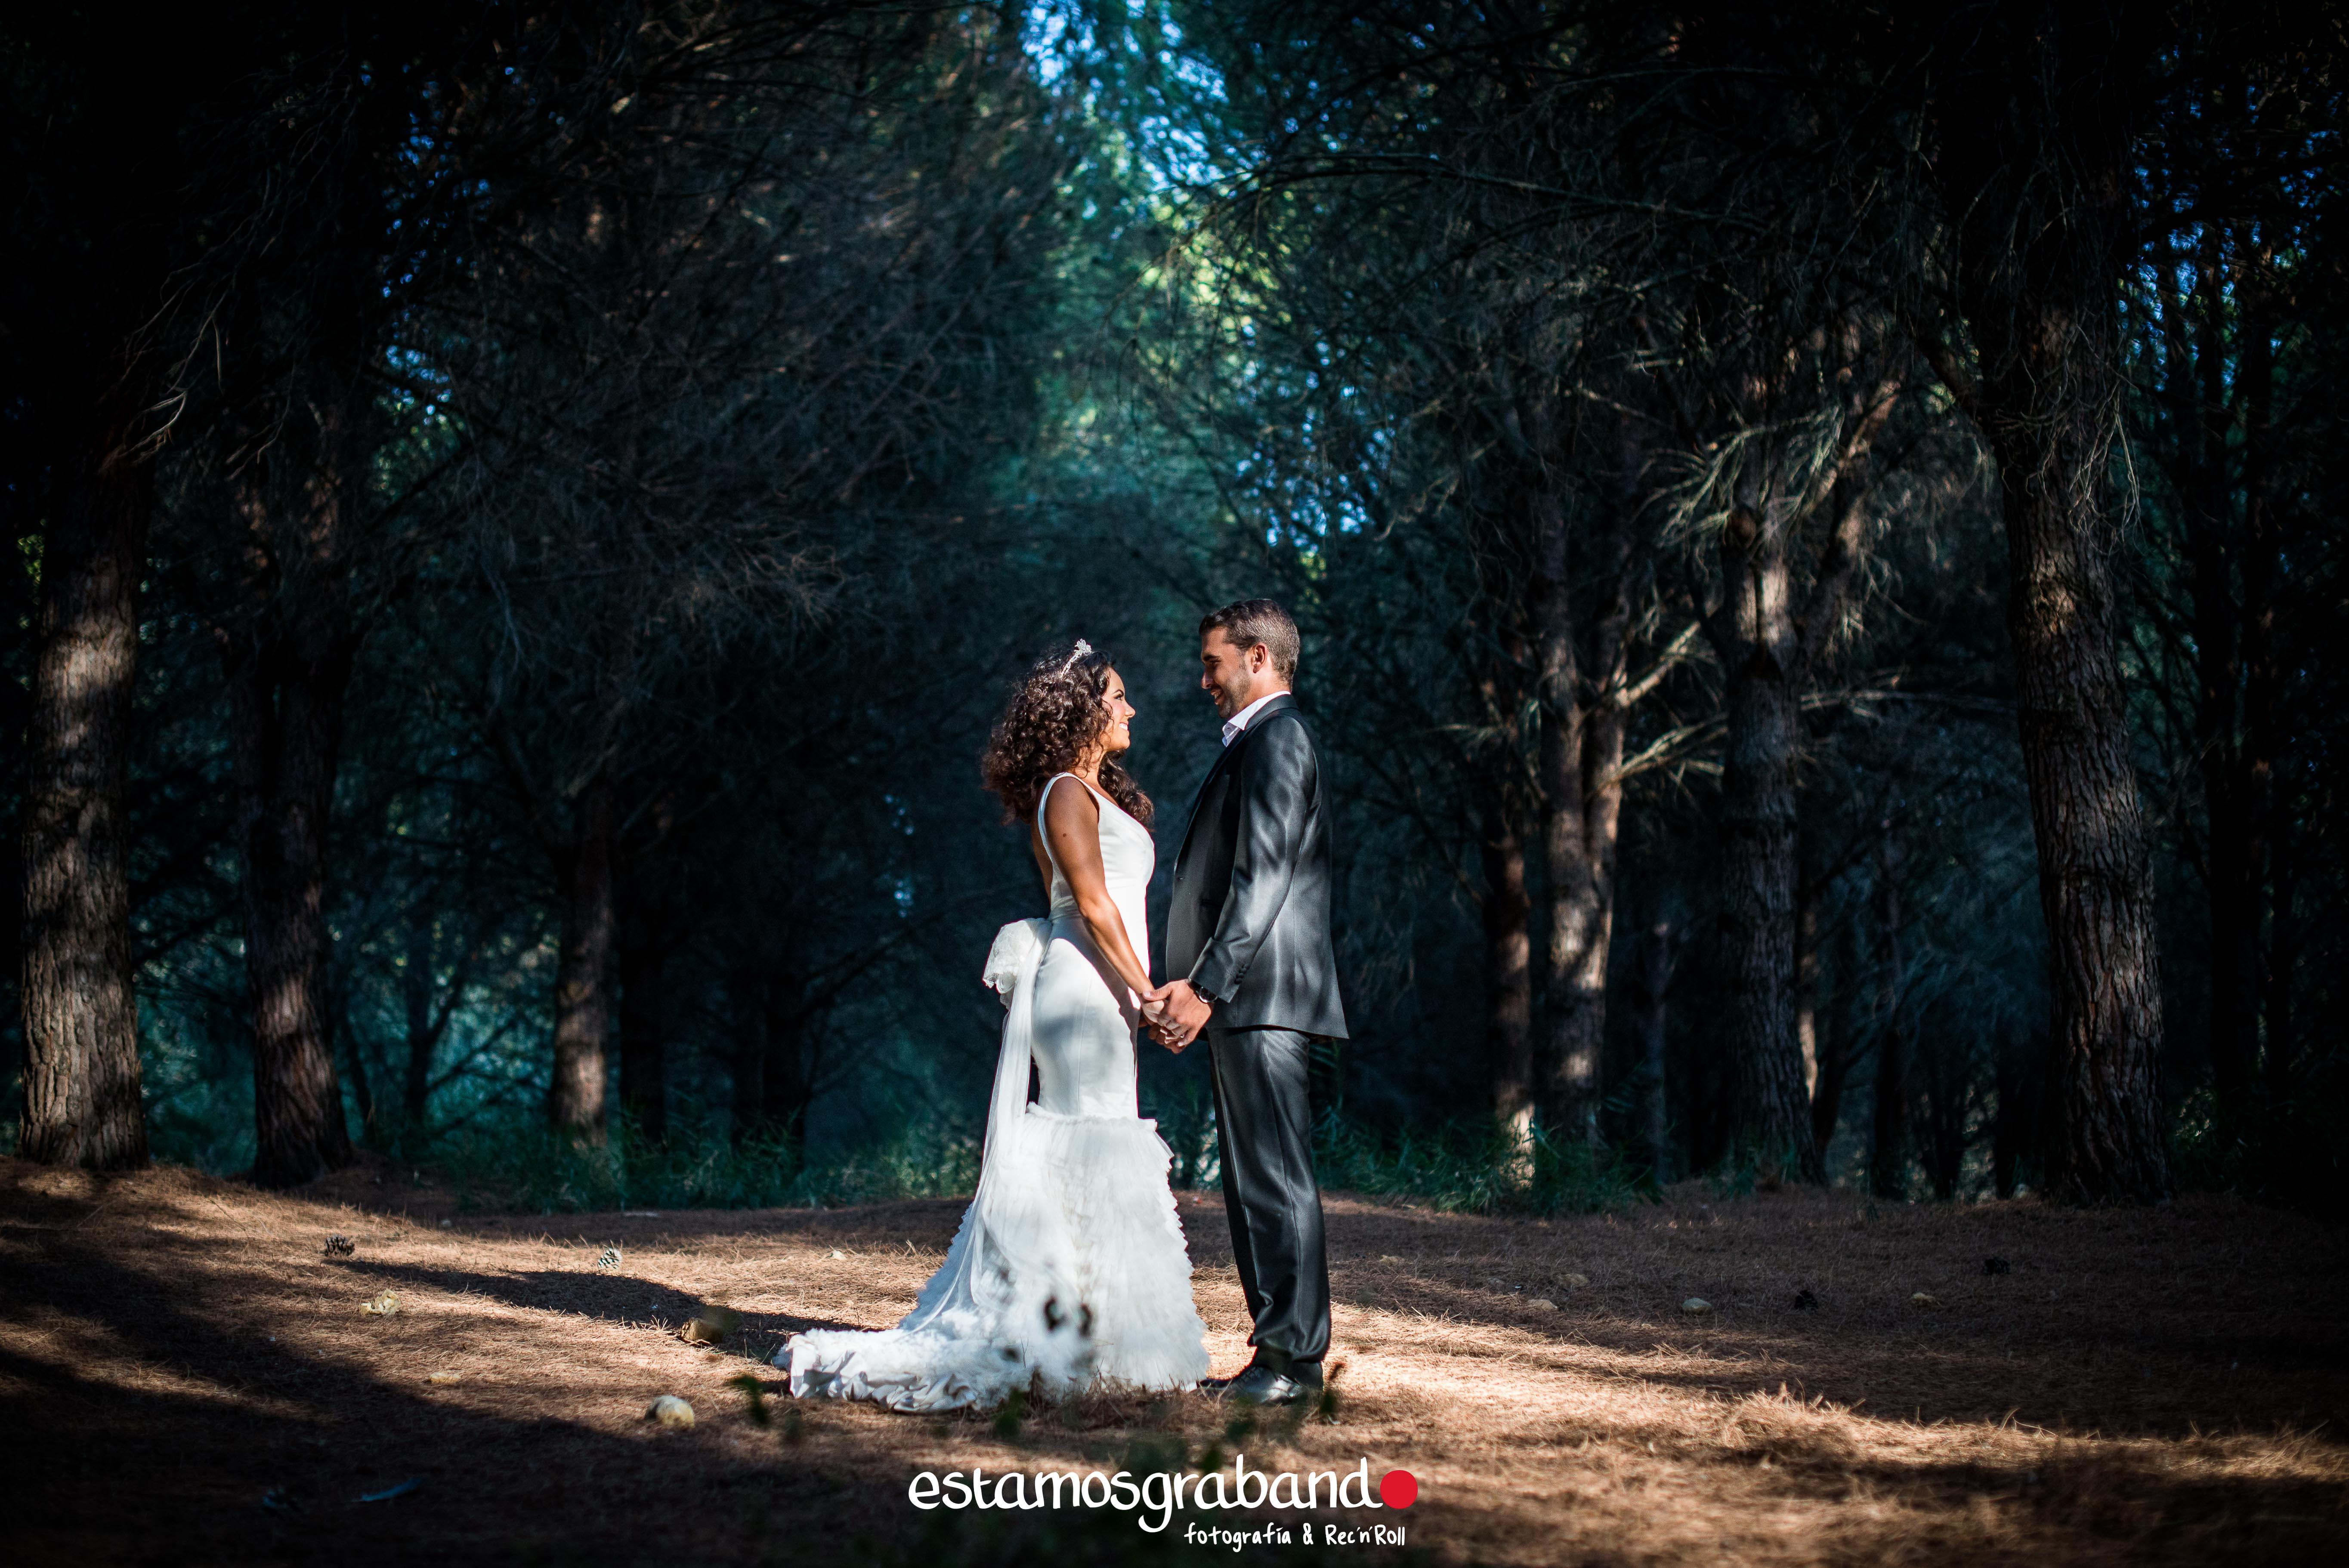 Demo-2017-Fotografía-de-Boda-23 Fotografía de Bodas Recandroller - video boda cadiz